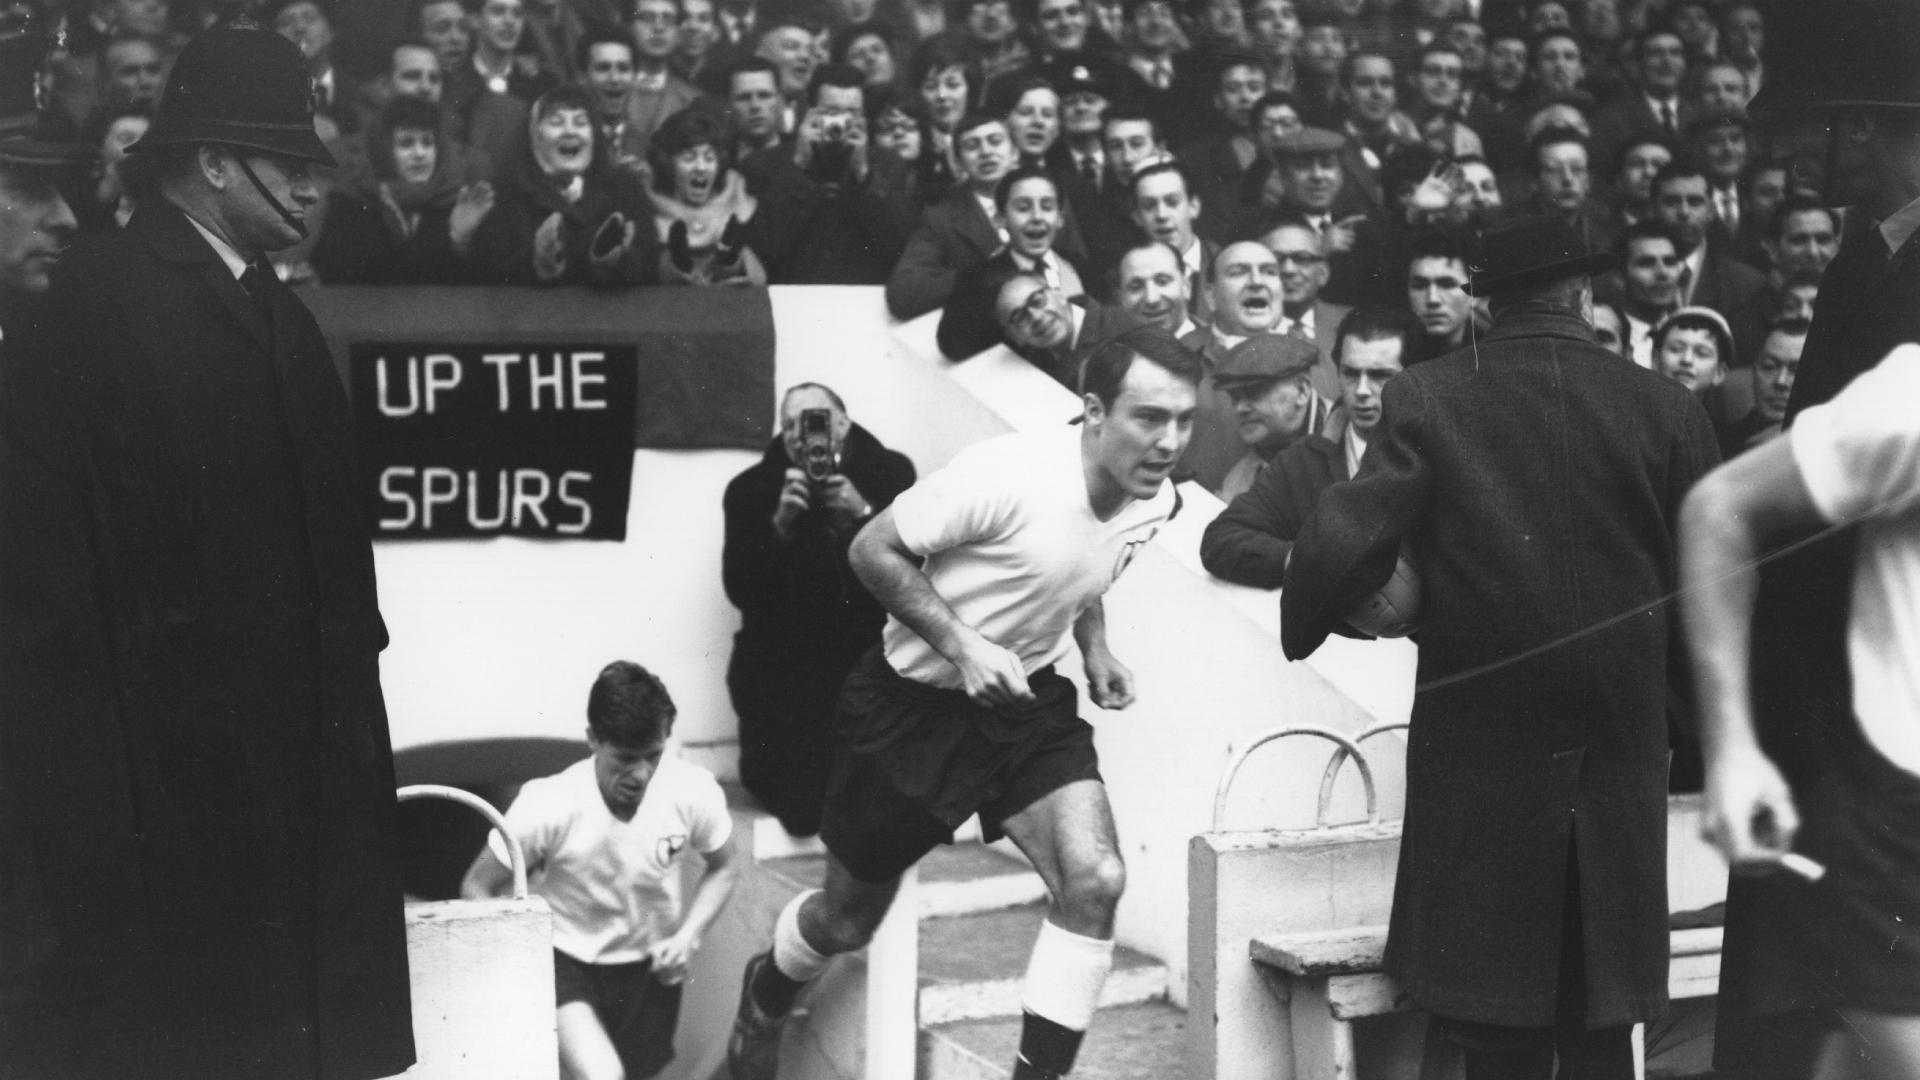 Tottenham's Greatest Jimmy Greaves